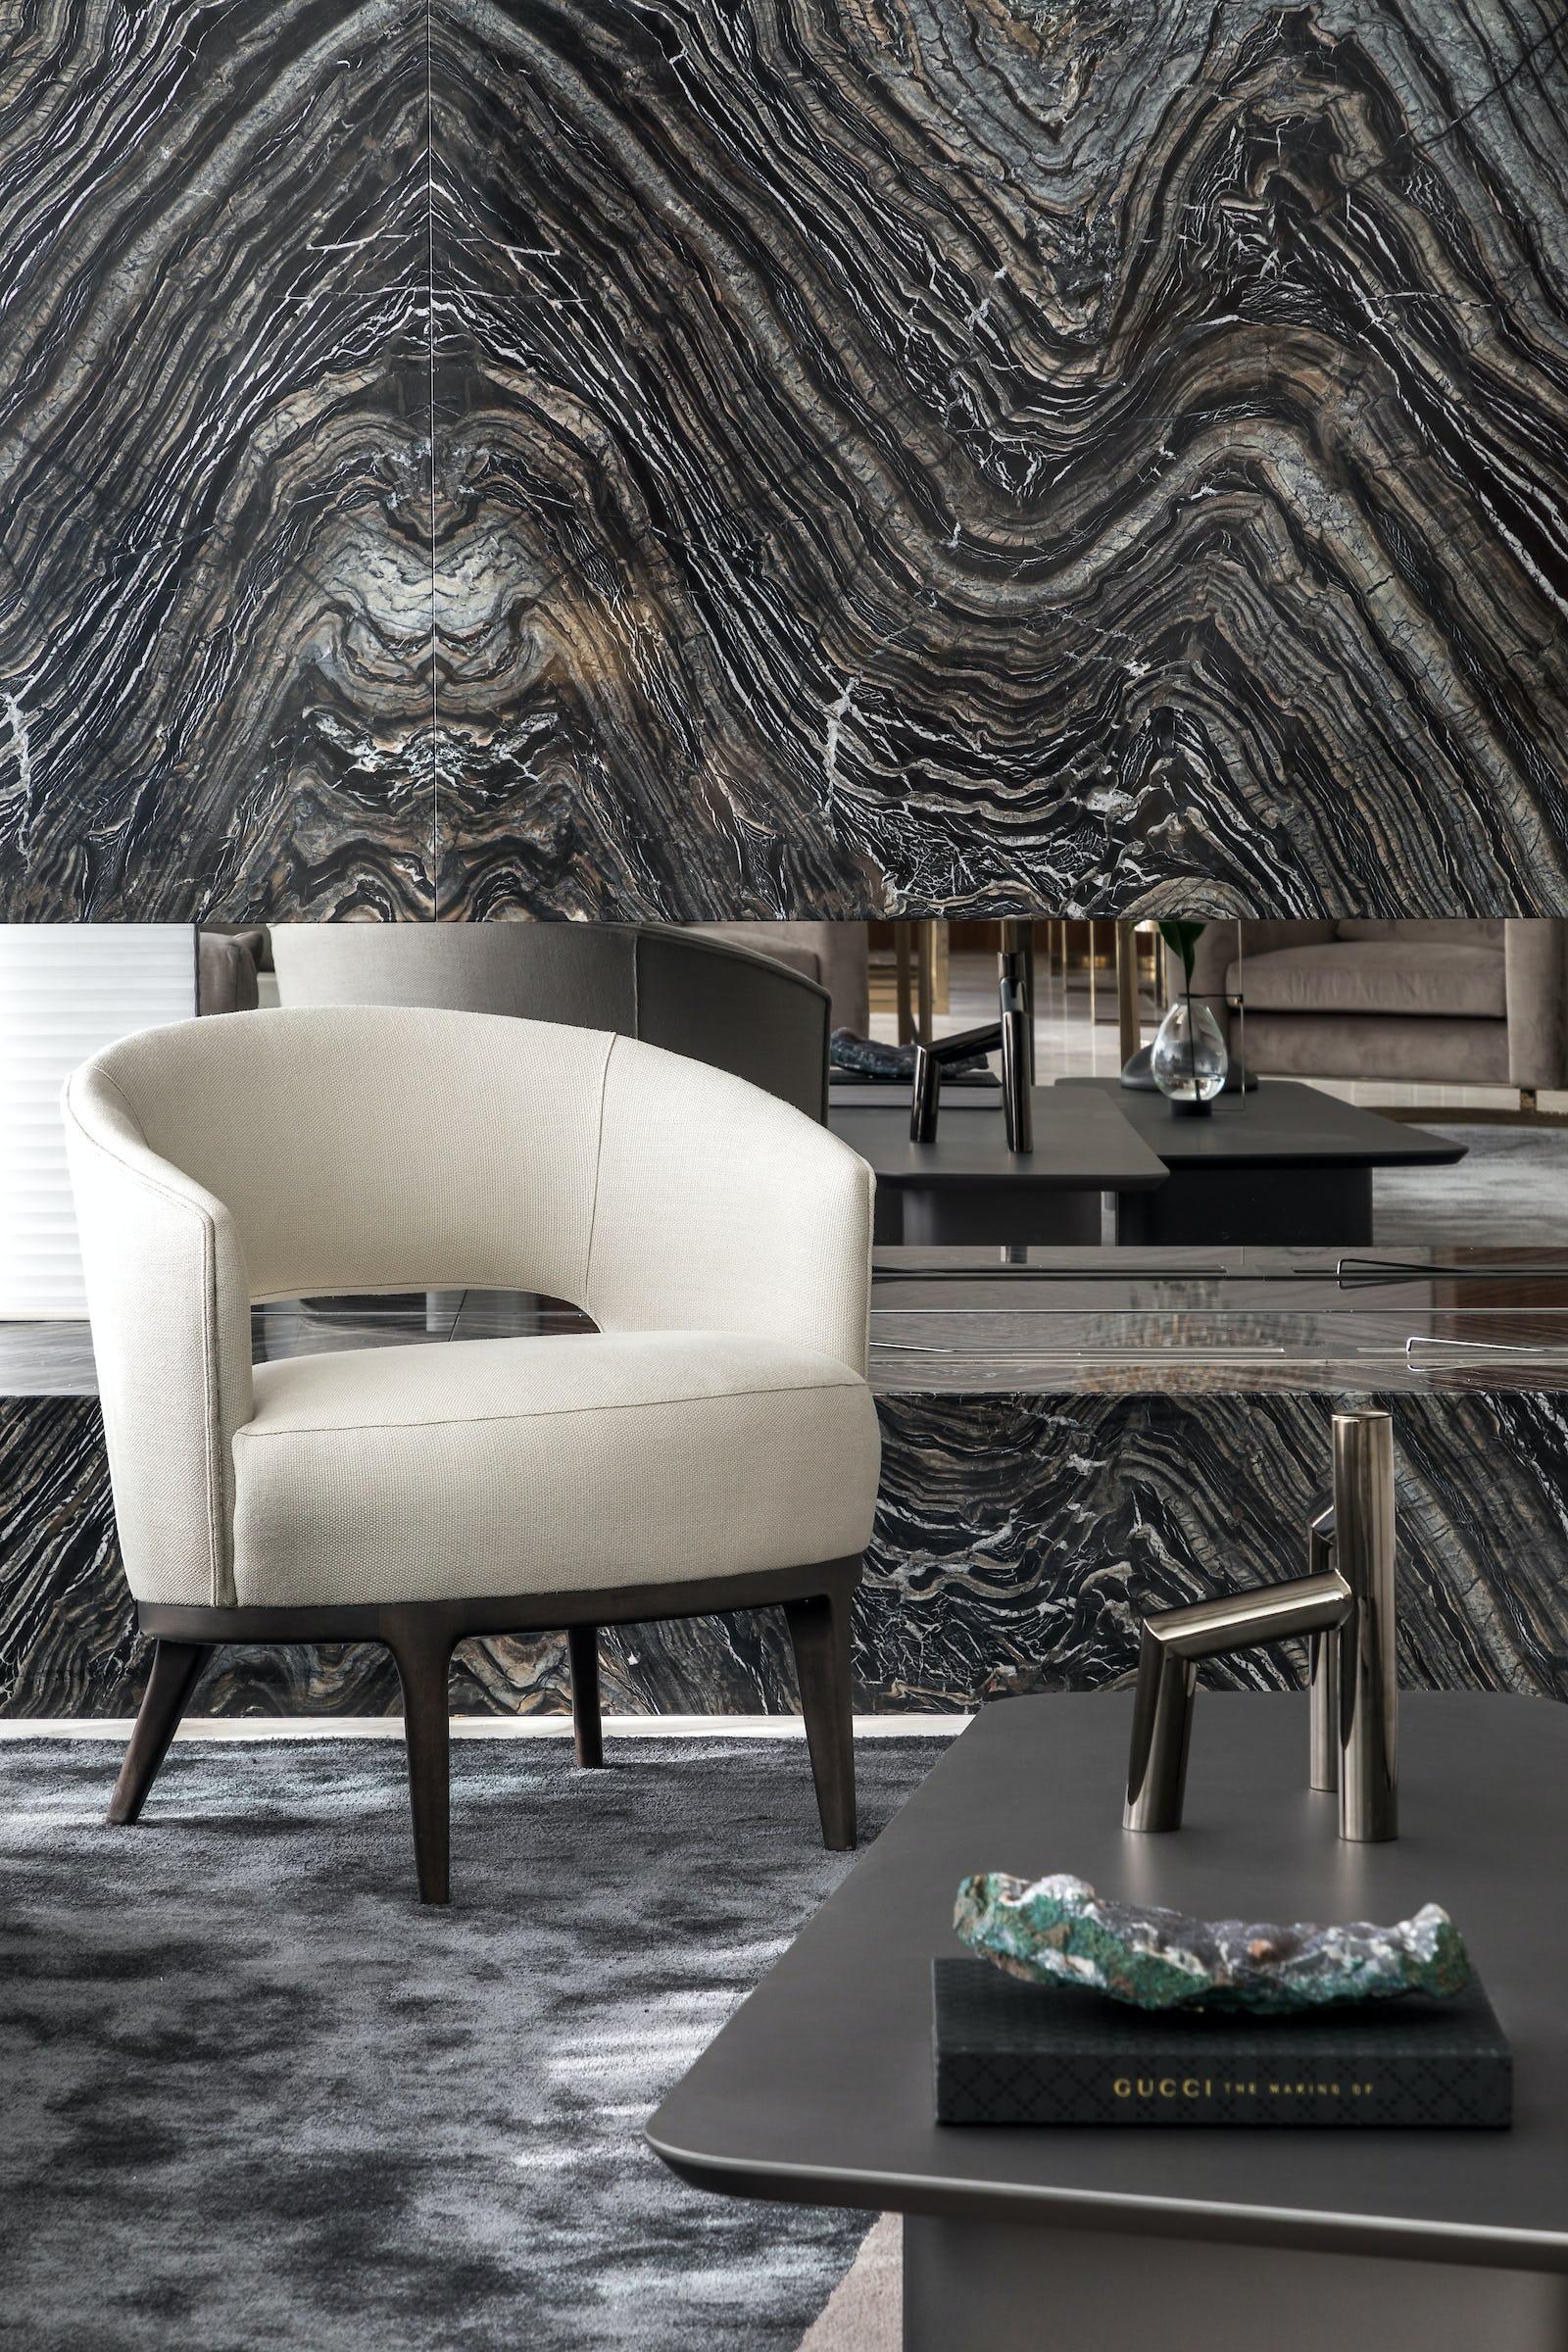 marmore nero madera living sala estar